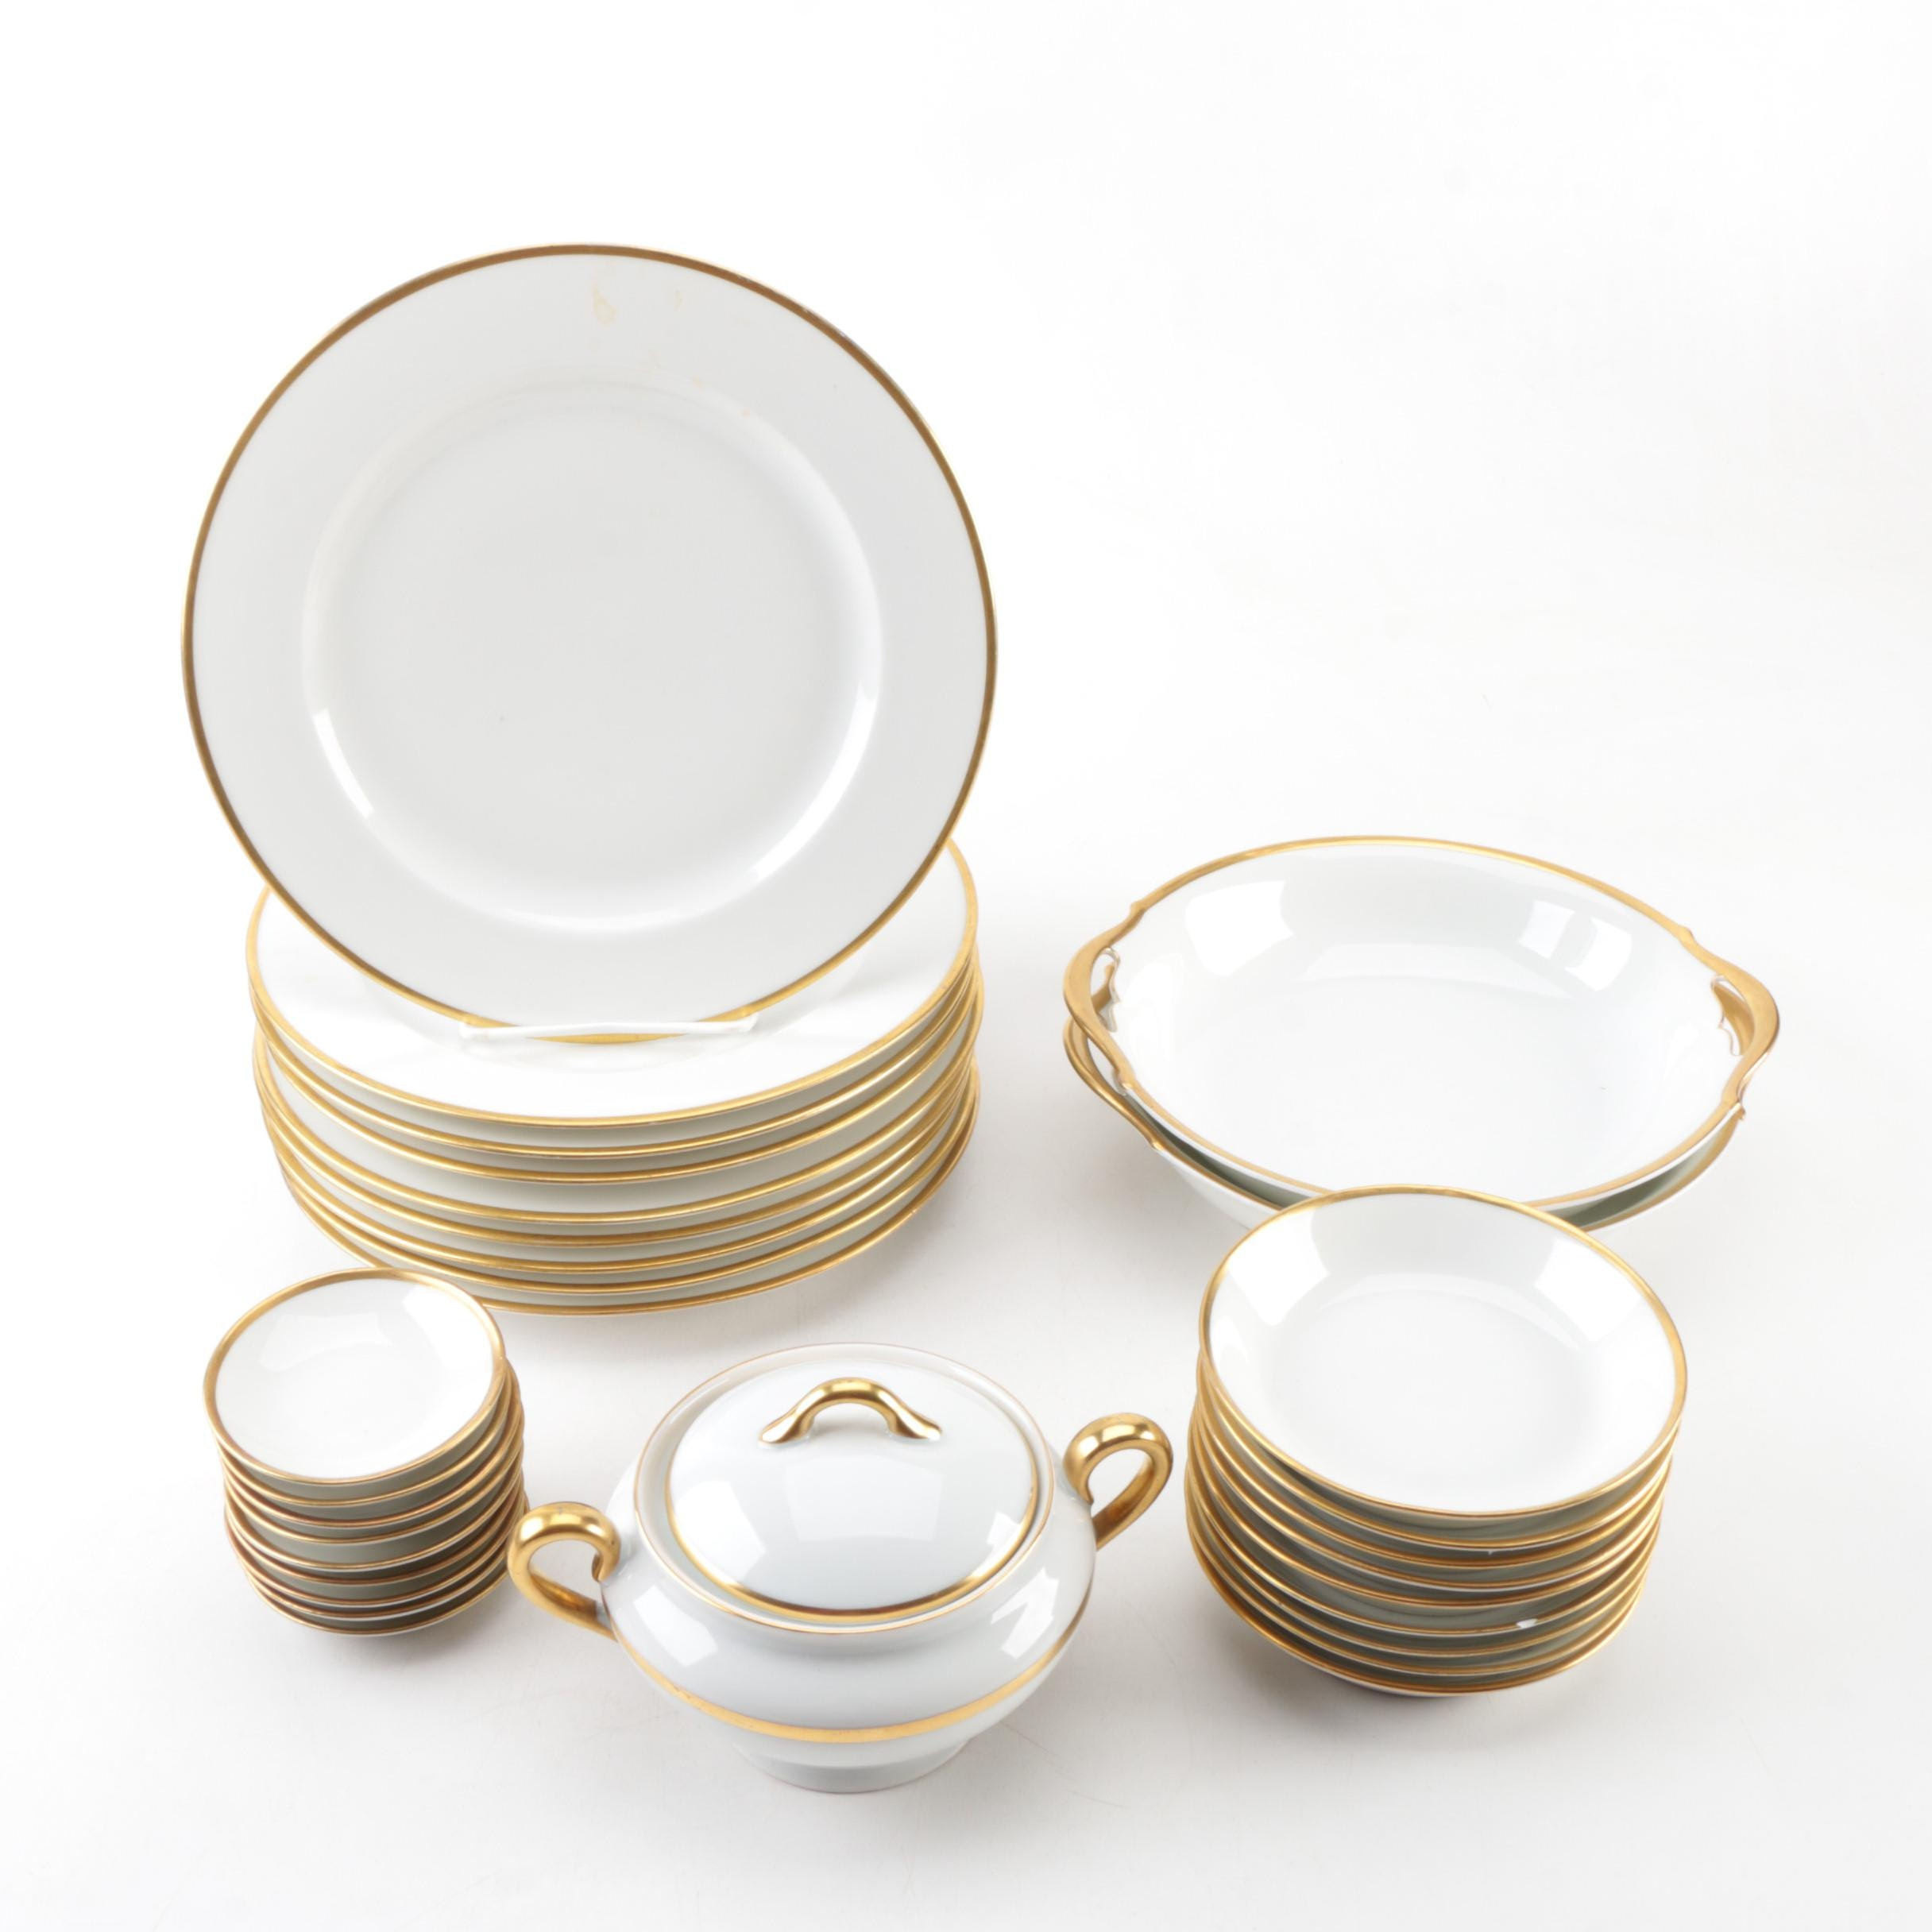 Tressemann u0026 Vogt and Vignaud Freres Limoges Porcelain Dinnerware ...  sc 1 st  EBTH.com & Tressemann u0026 Vogt and Vignaud Freres Limoges Porcelain Dinnerware : EBTH